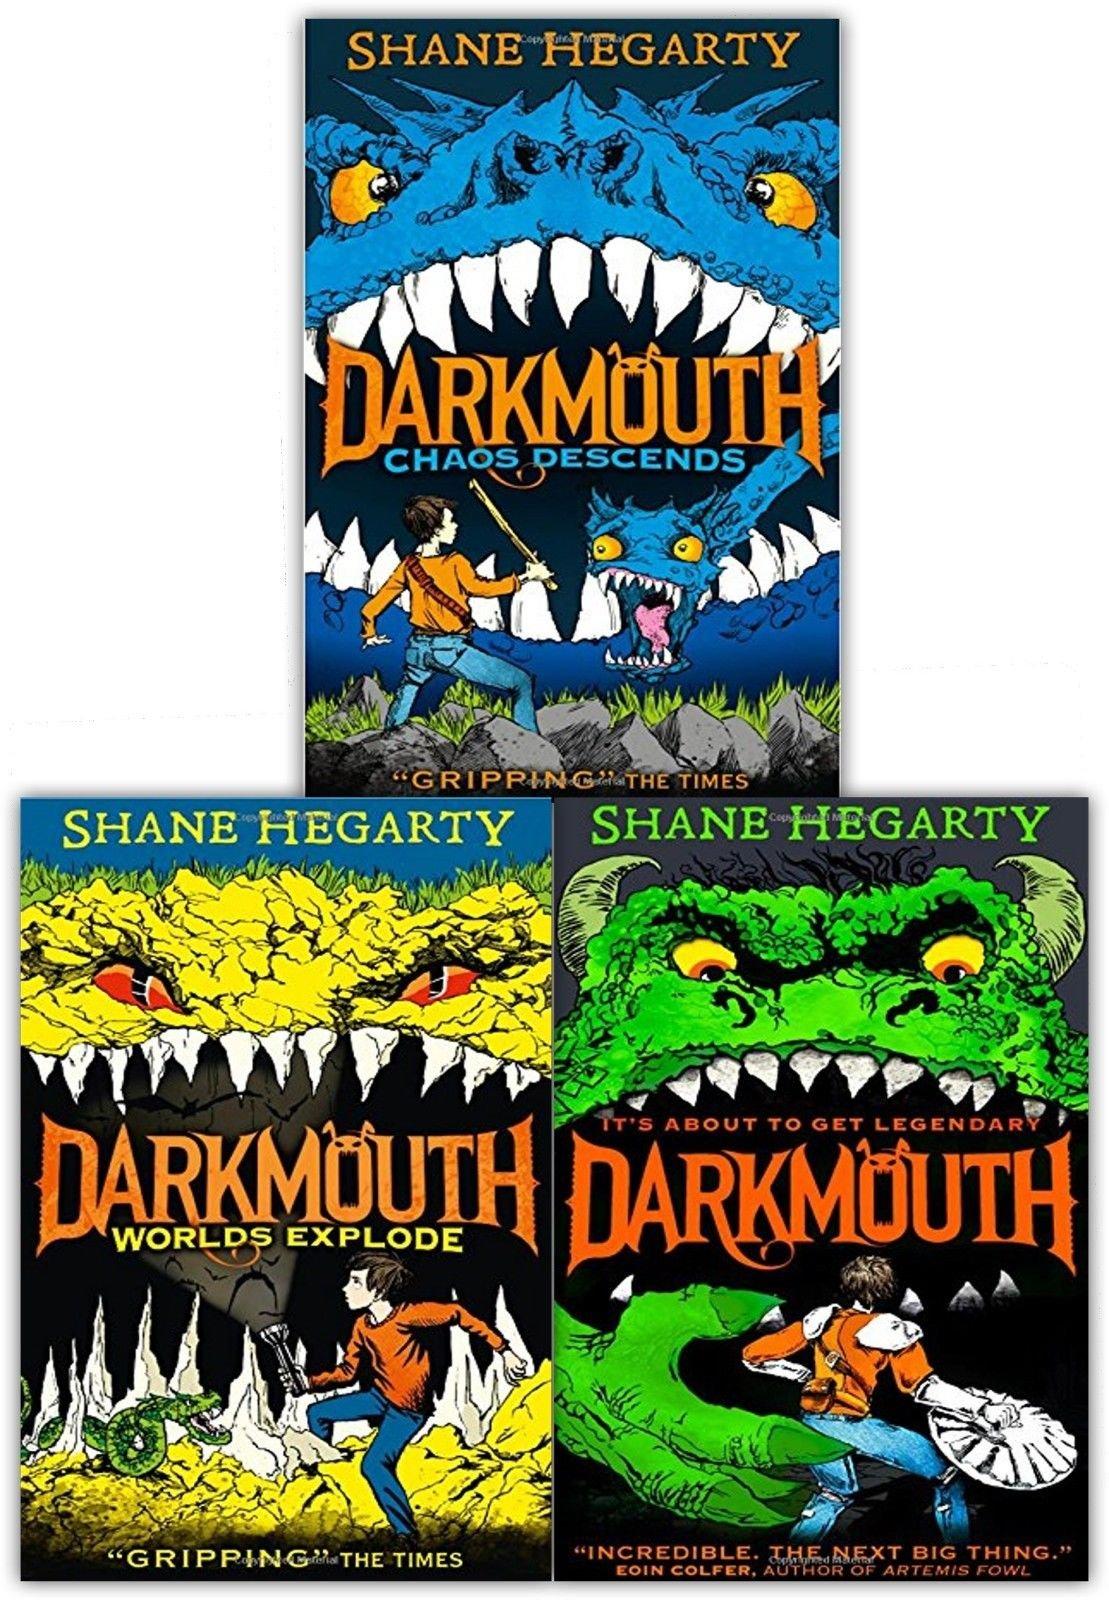 Shane Hegarty Darkmouth.jpg